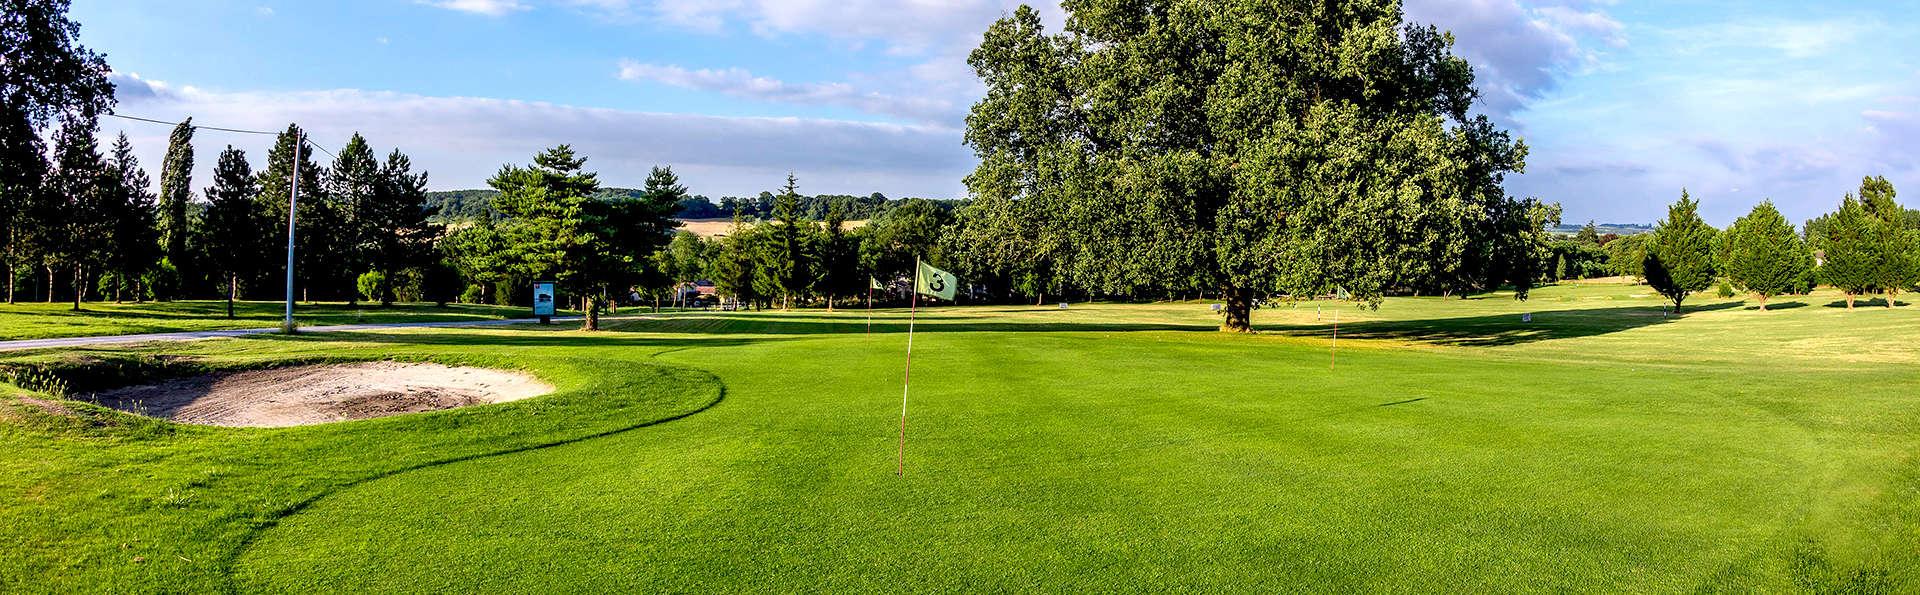 Résidence le Domaine du Golf d'Albret - Edit_Golf3.jpg